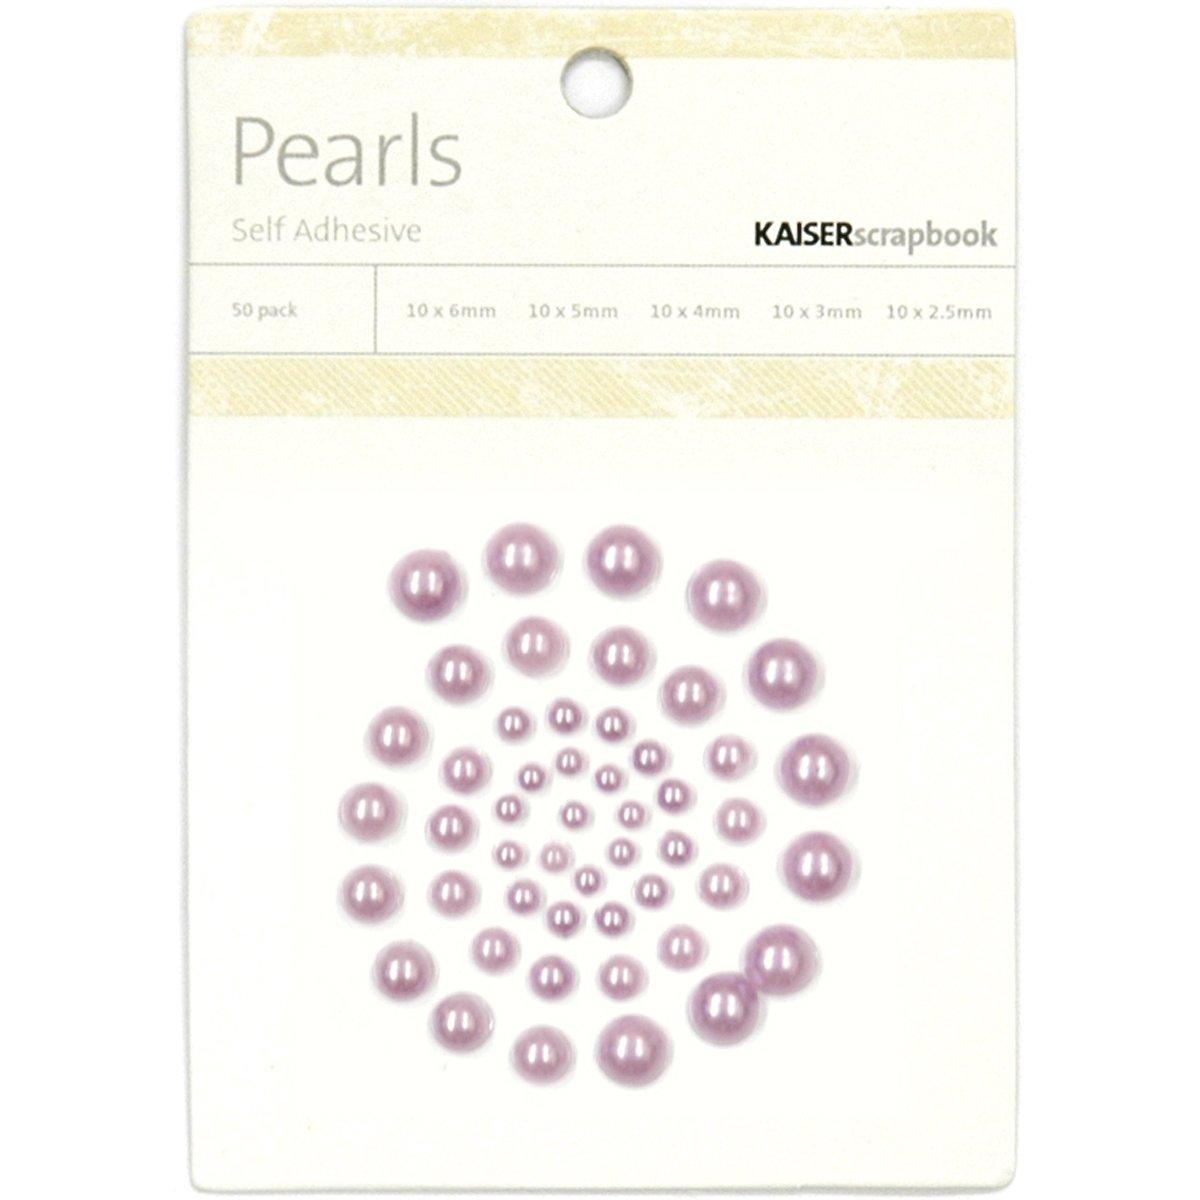 Kaiser Craft - Pearls, Self Adhesive - Lavender